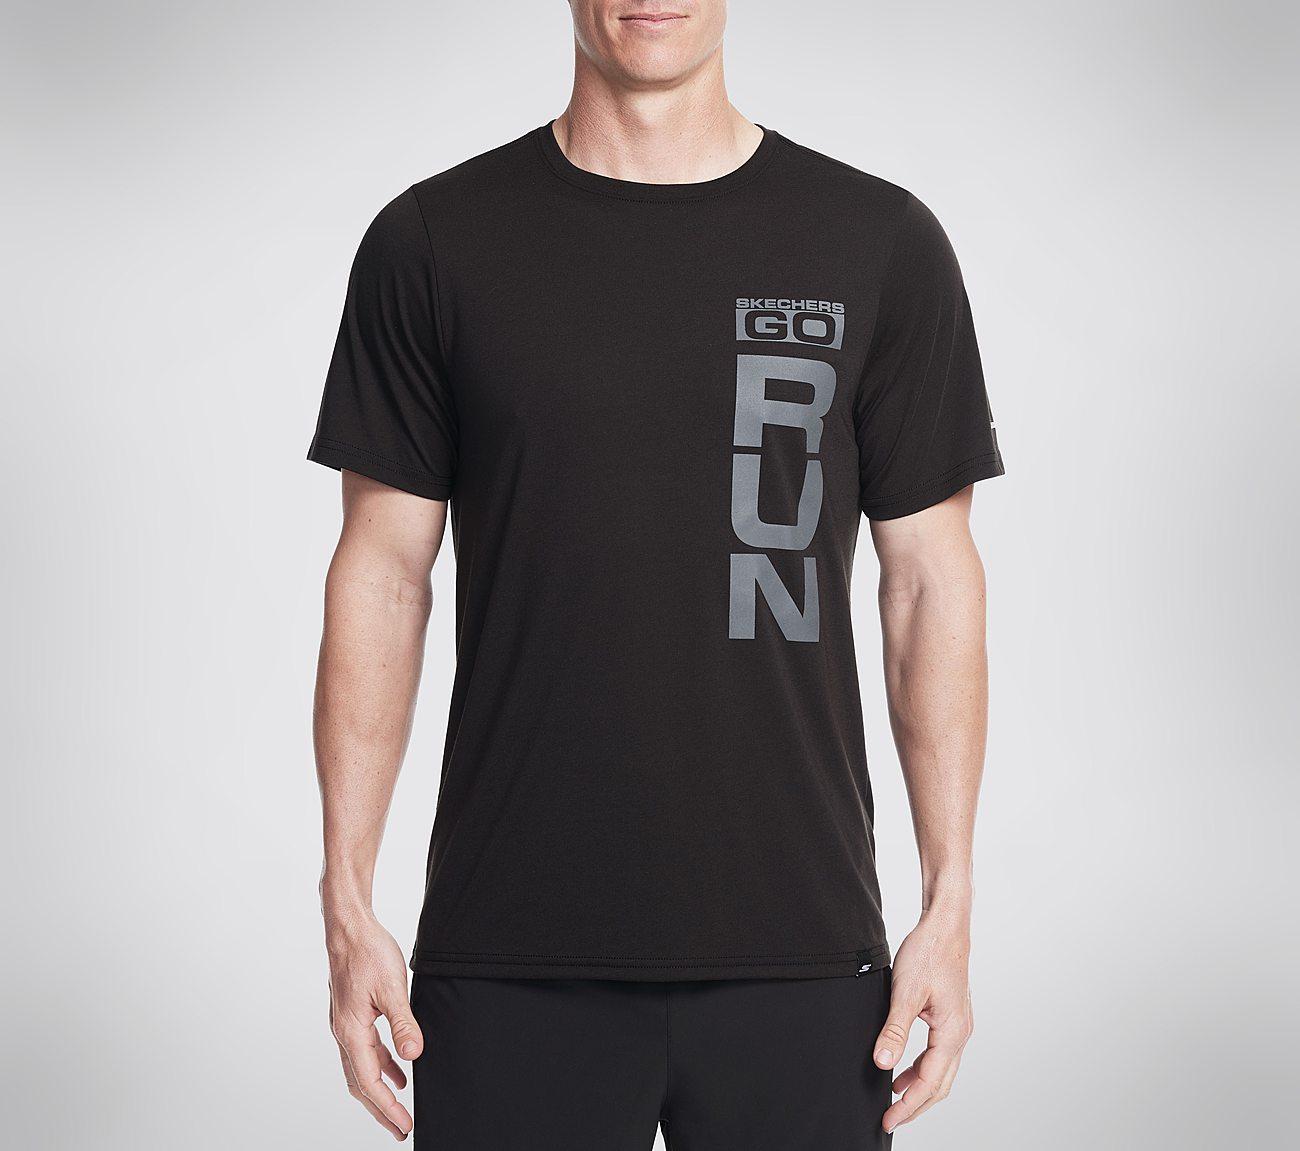 Skechers GOrun Tee Shirt